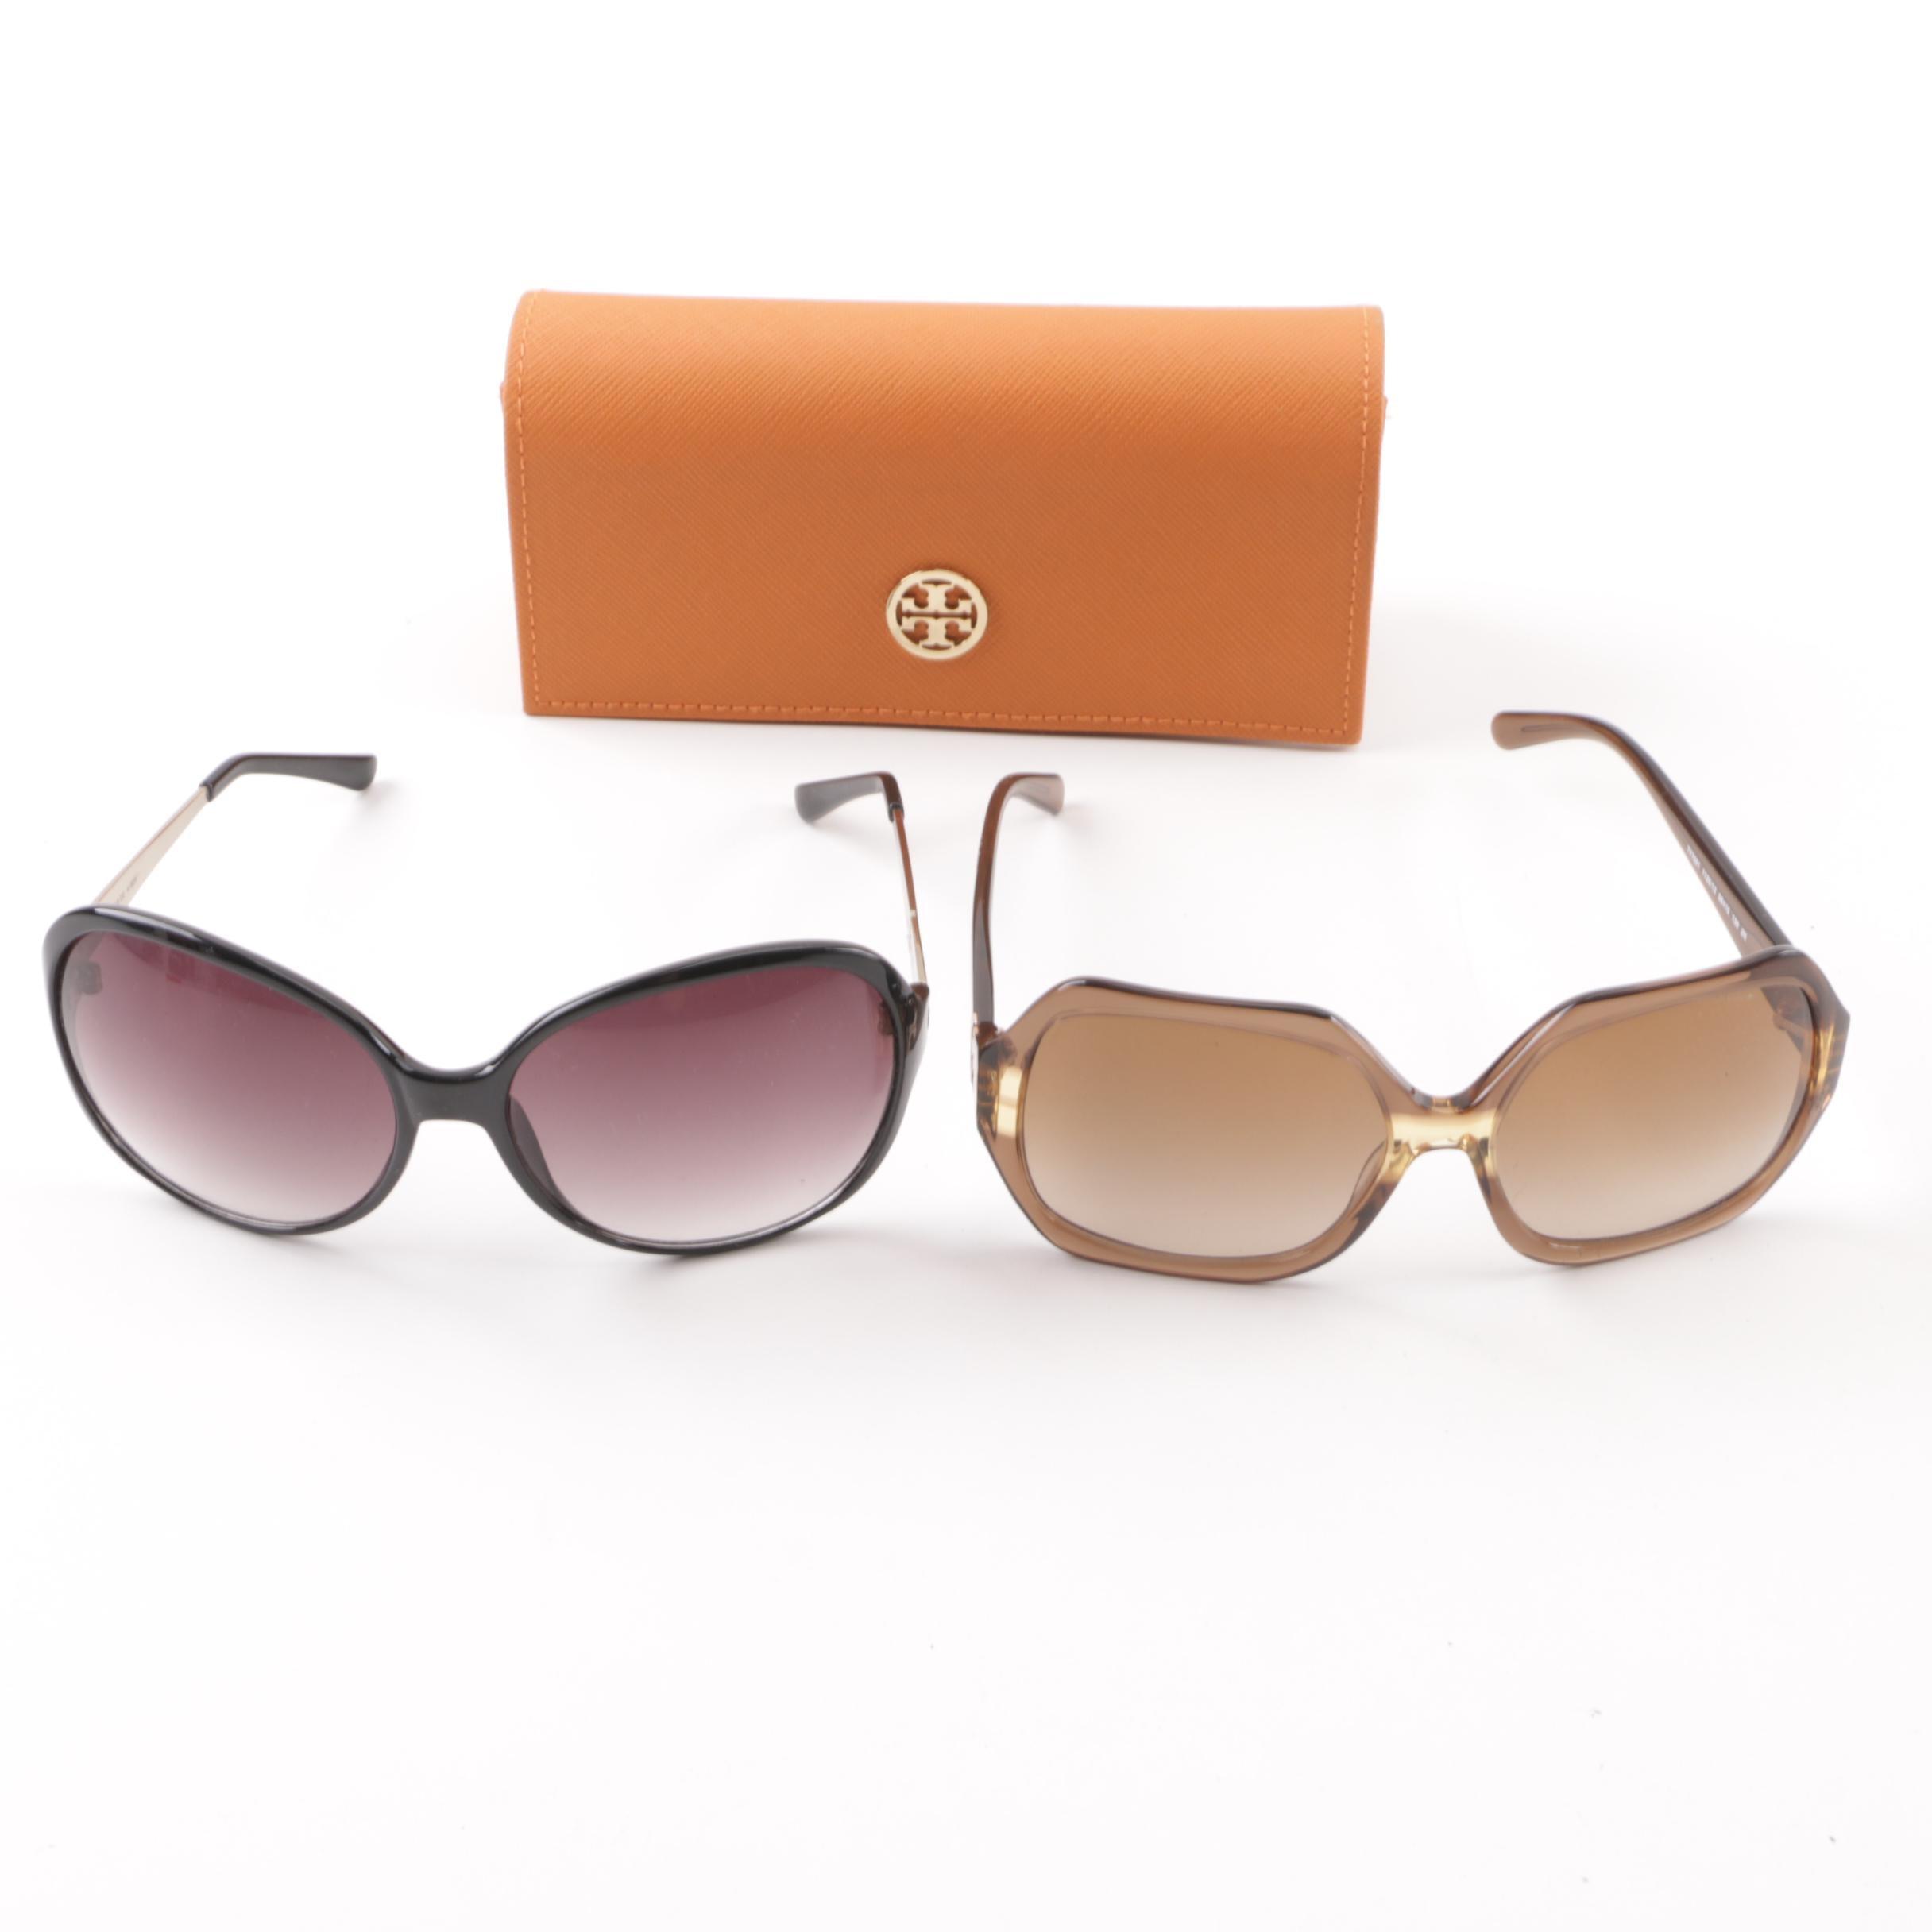 Tory Burch and O by Oscar de la Renta Sunglasses